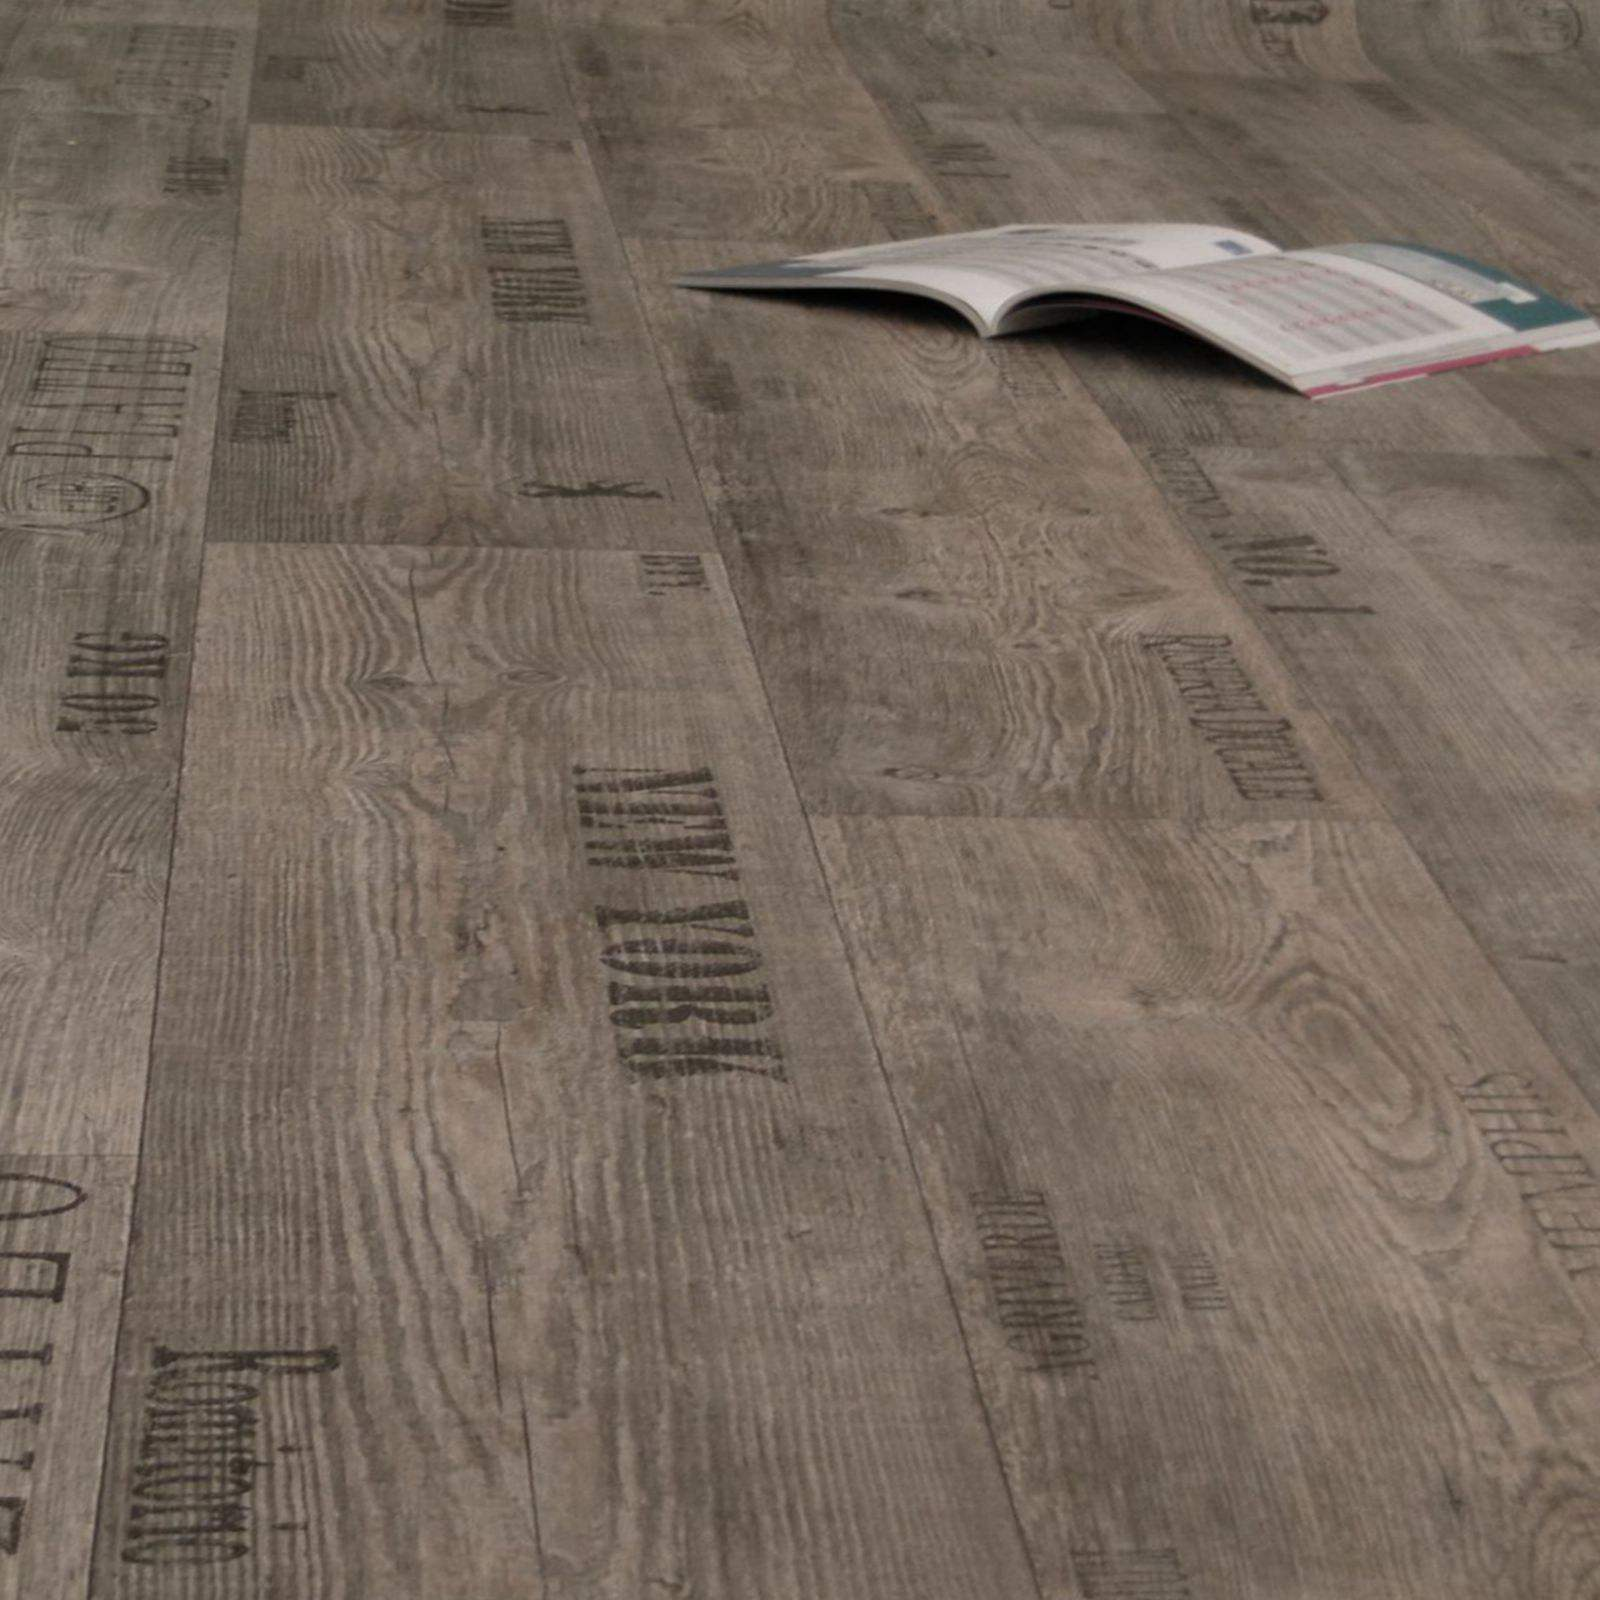 pvc bodenbelag rustikal grau mit aufdruck m u s t e r. Black Bedroom Furniture Sets. Home Design Ideas